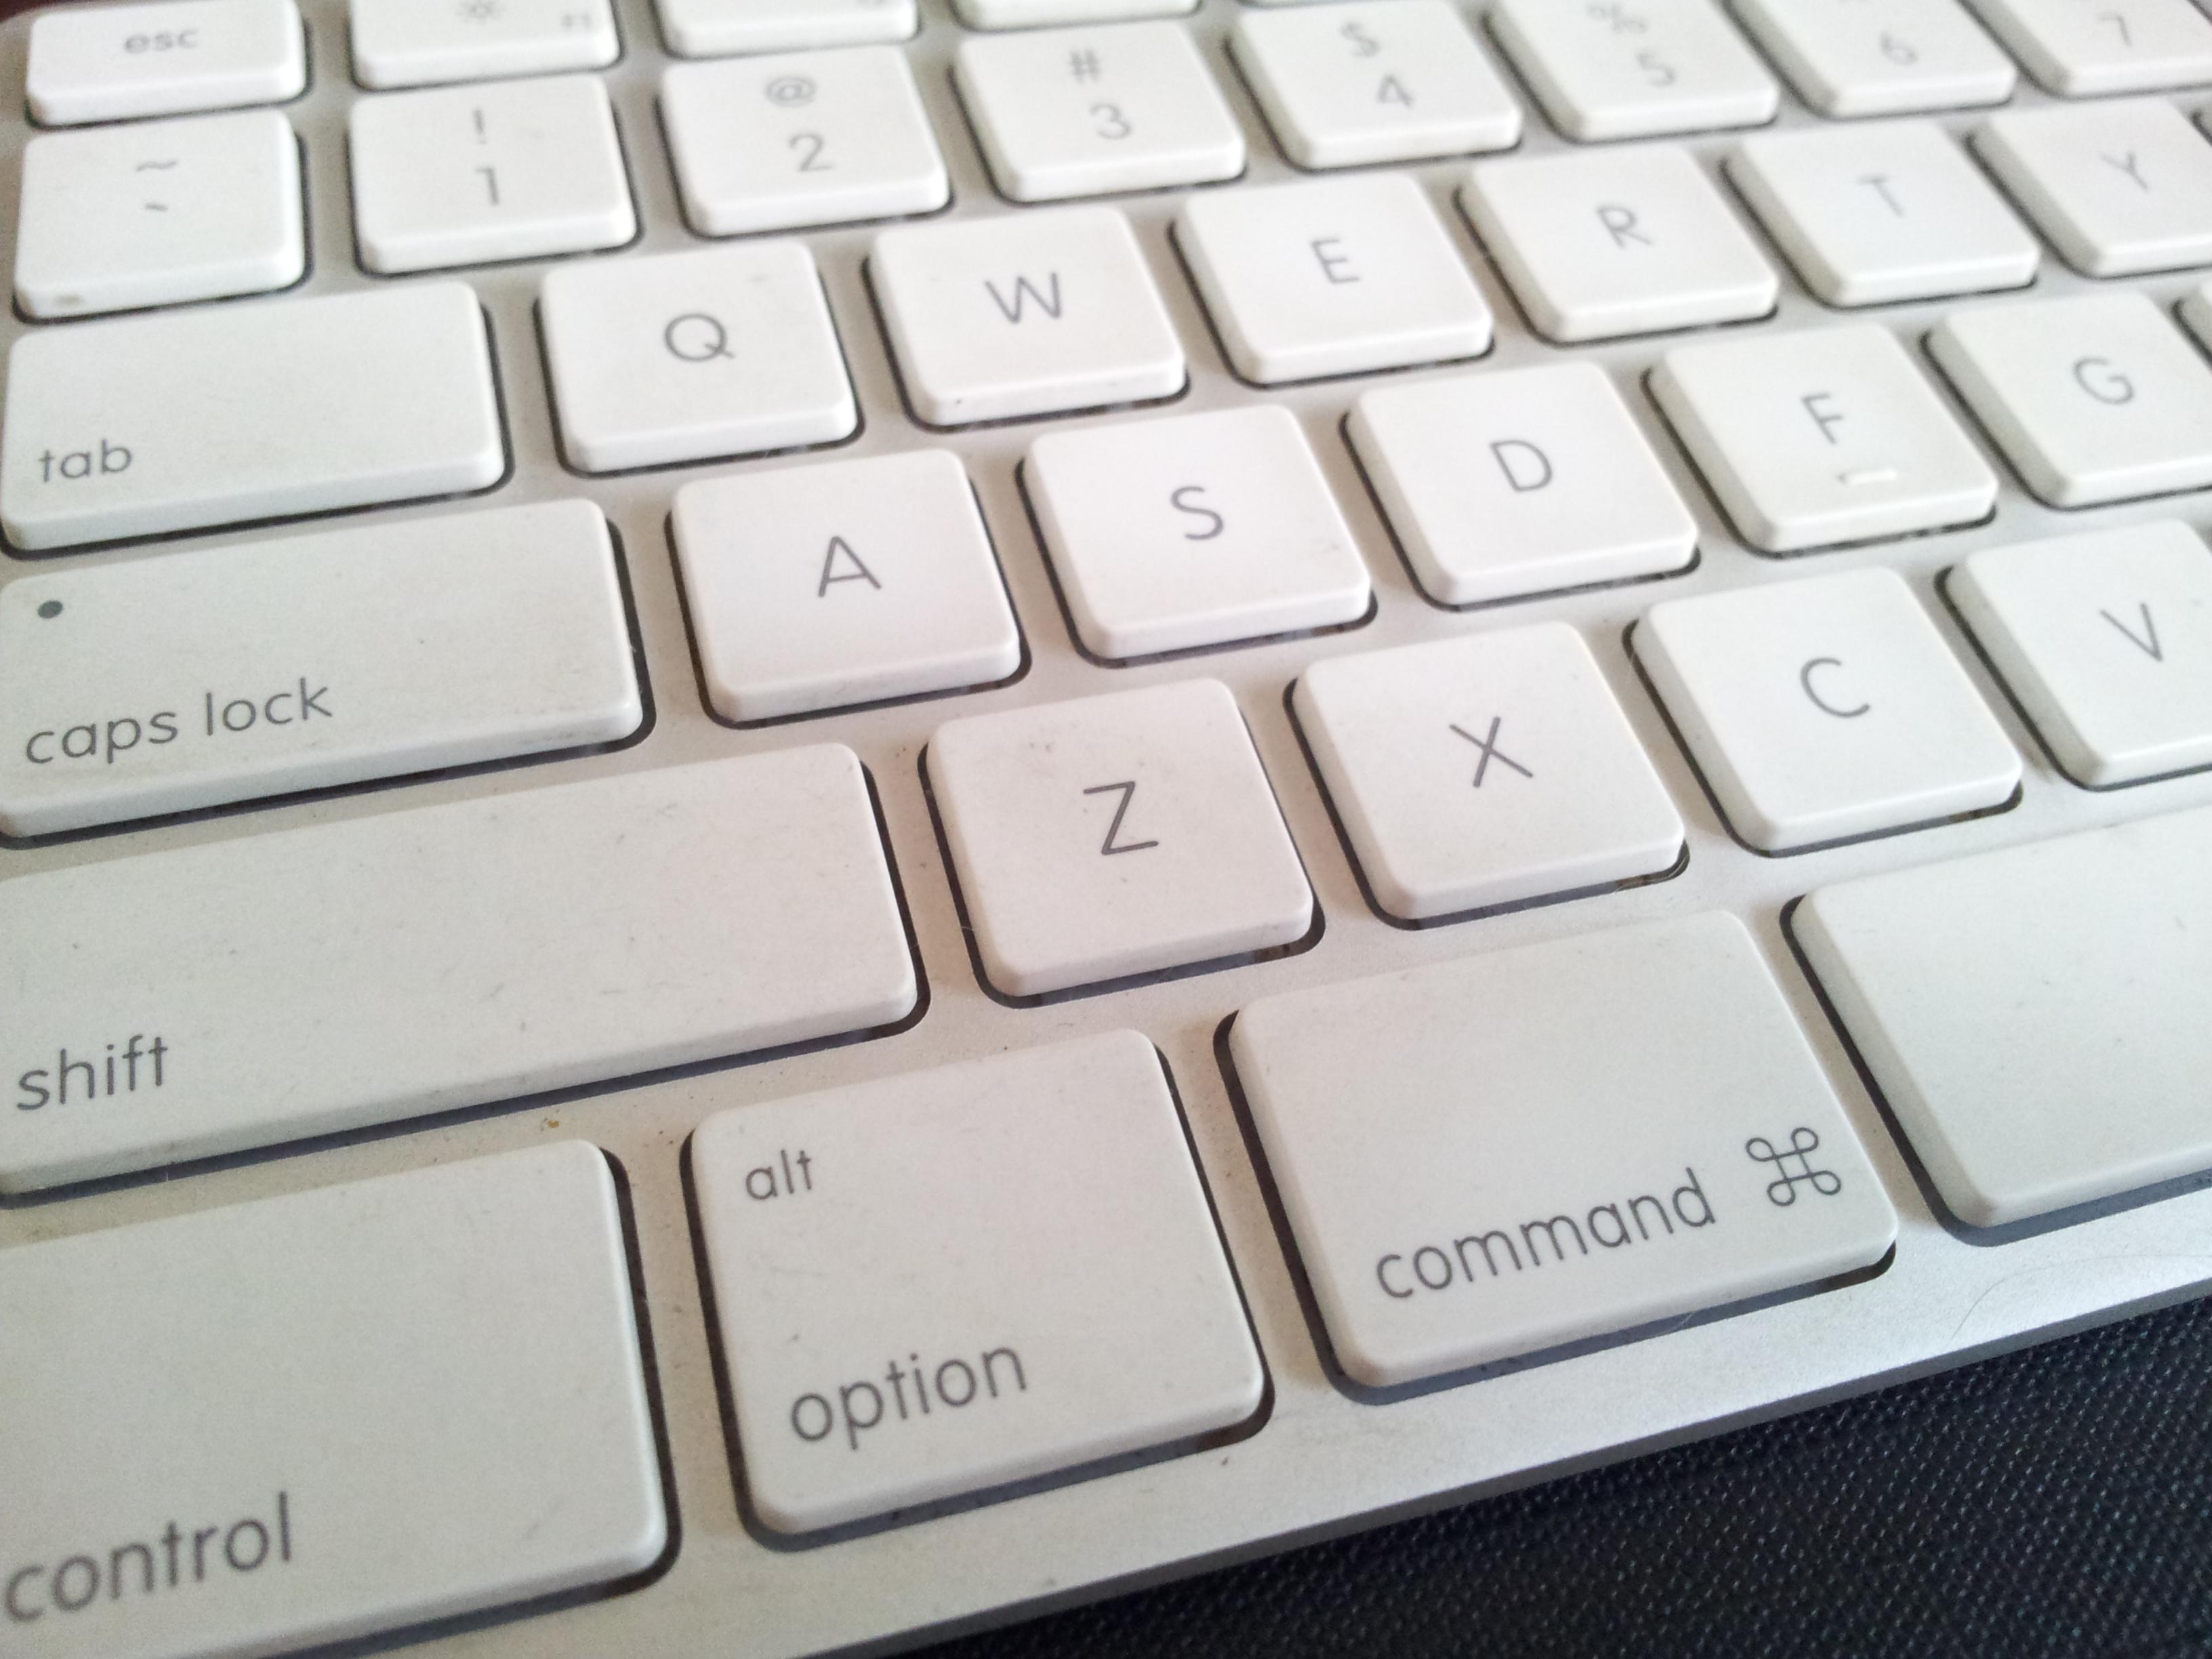 how to clean my imac keyboard